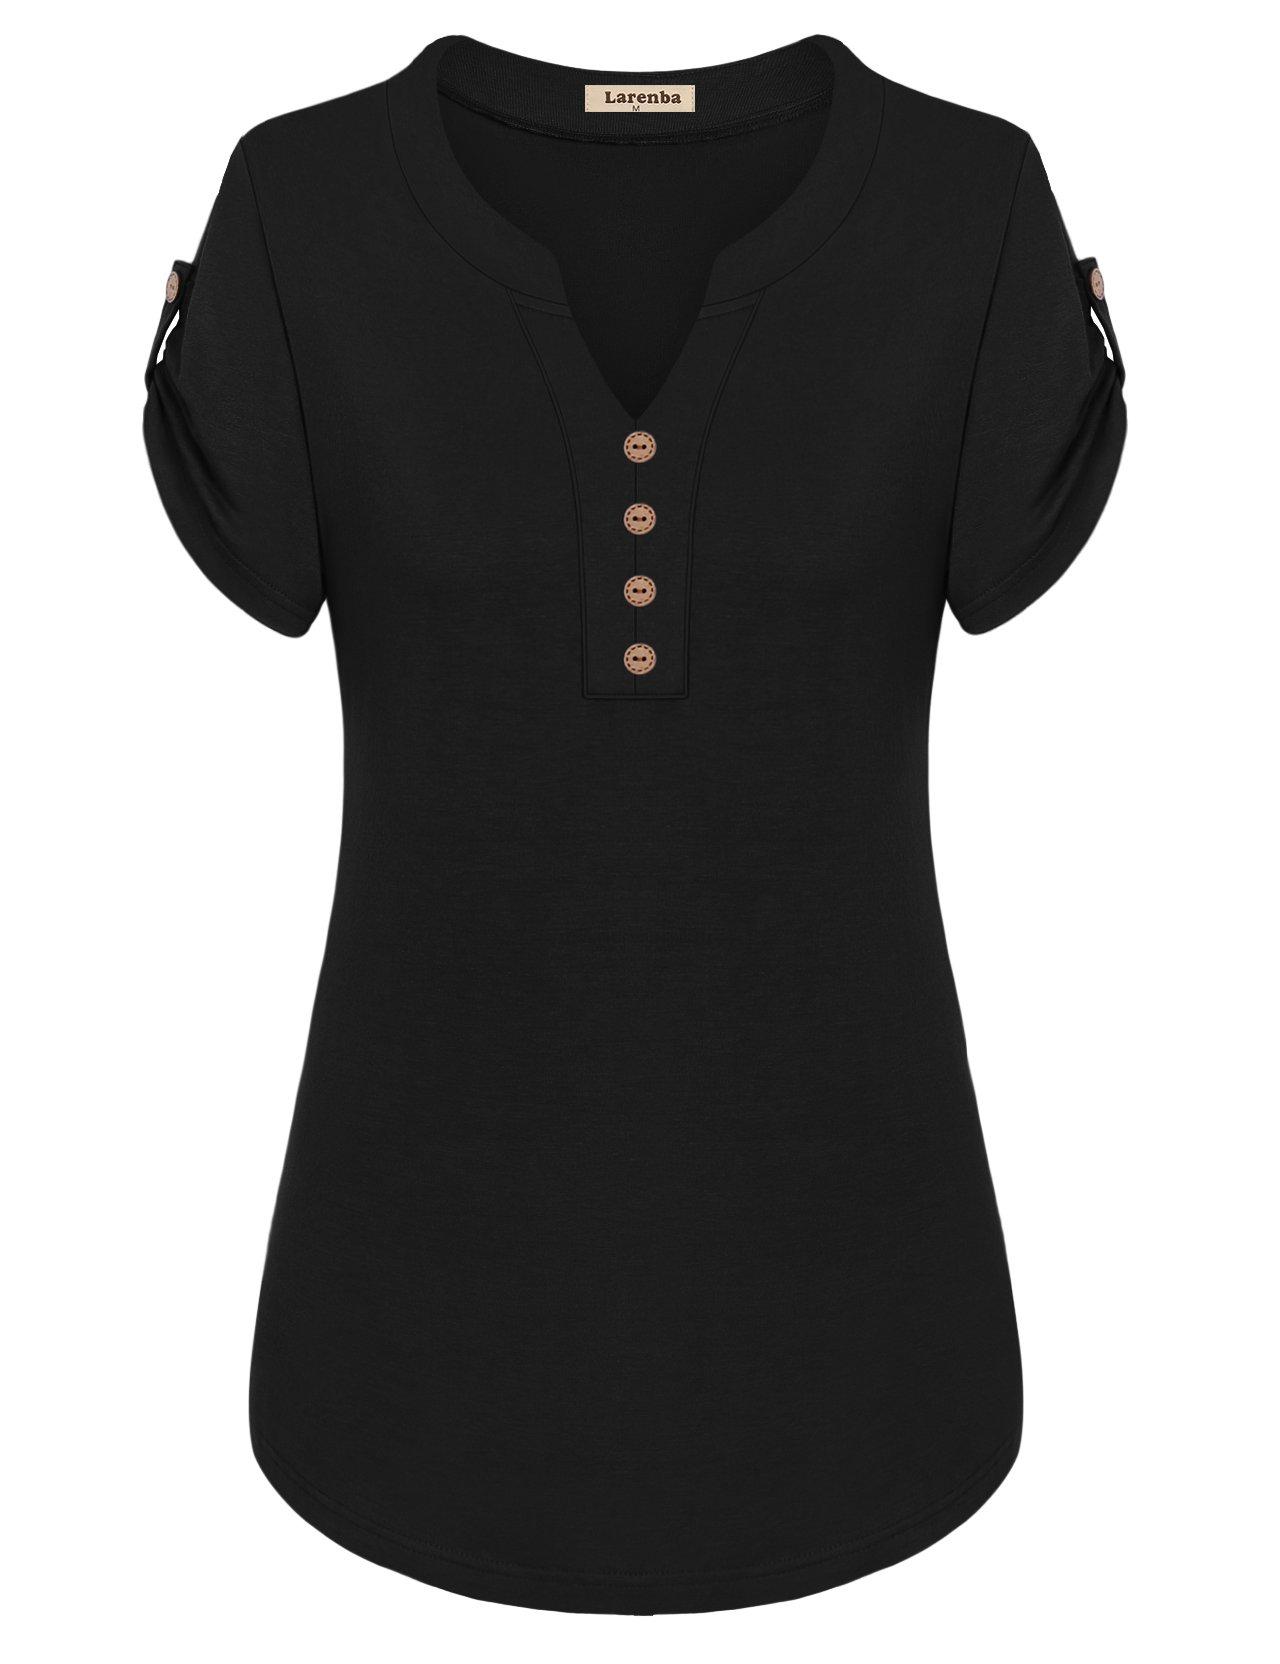 Larenba Short Sleeve Henley Shirts Women, Juniors V Neck Wear to Work Henley Shirts Casual Blouses(Black,Small)